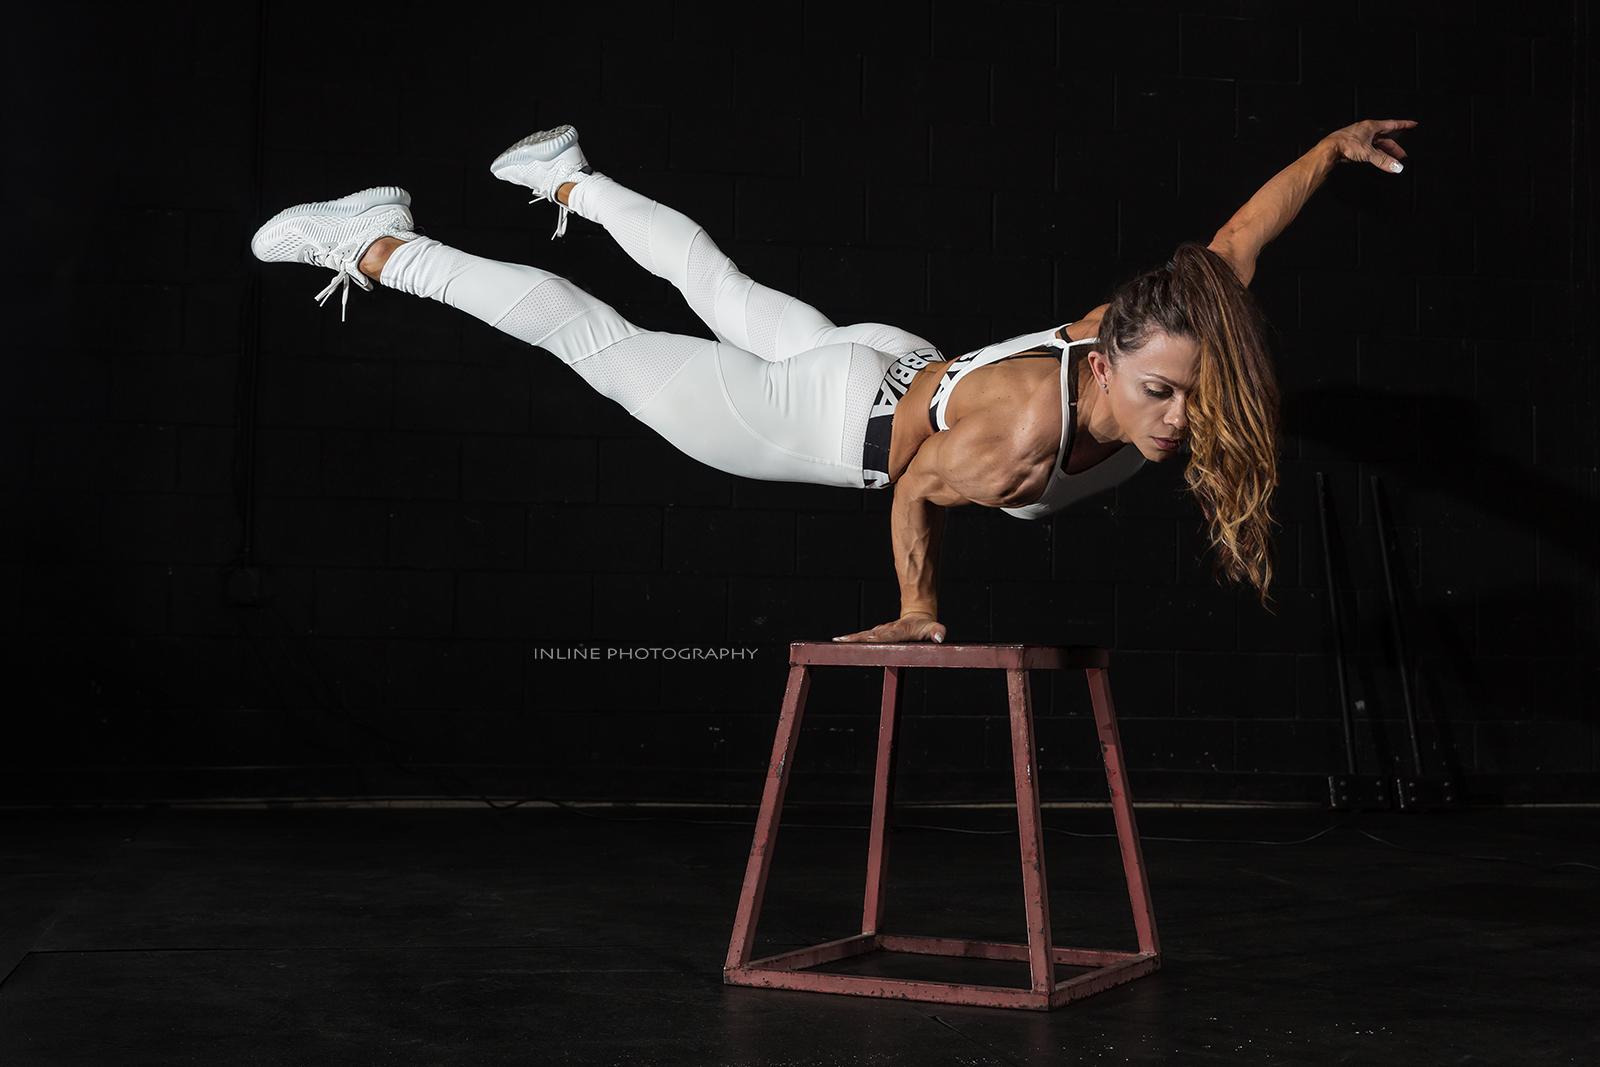 170915-Nebbia-Fitness-1396.jpg